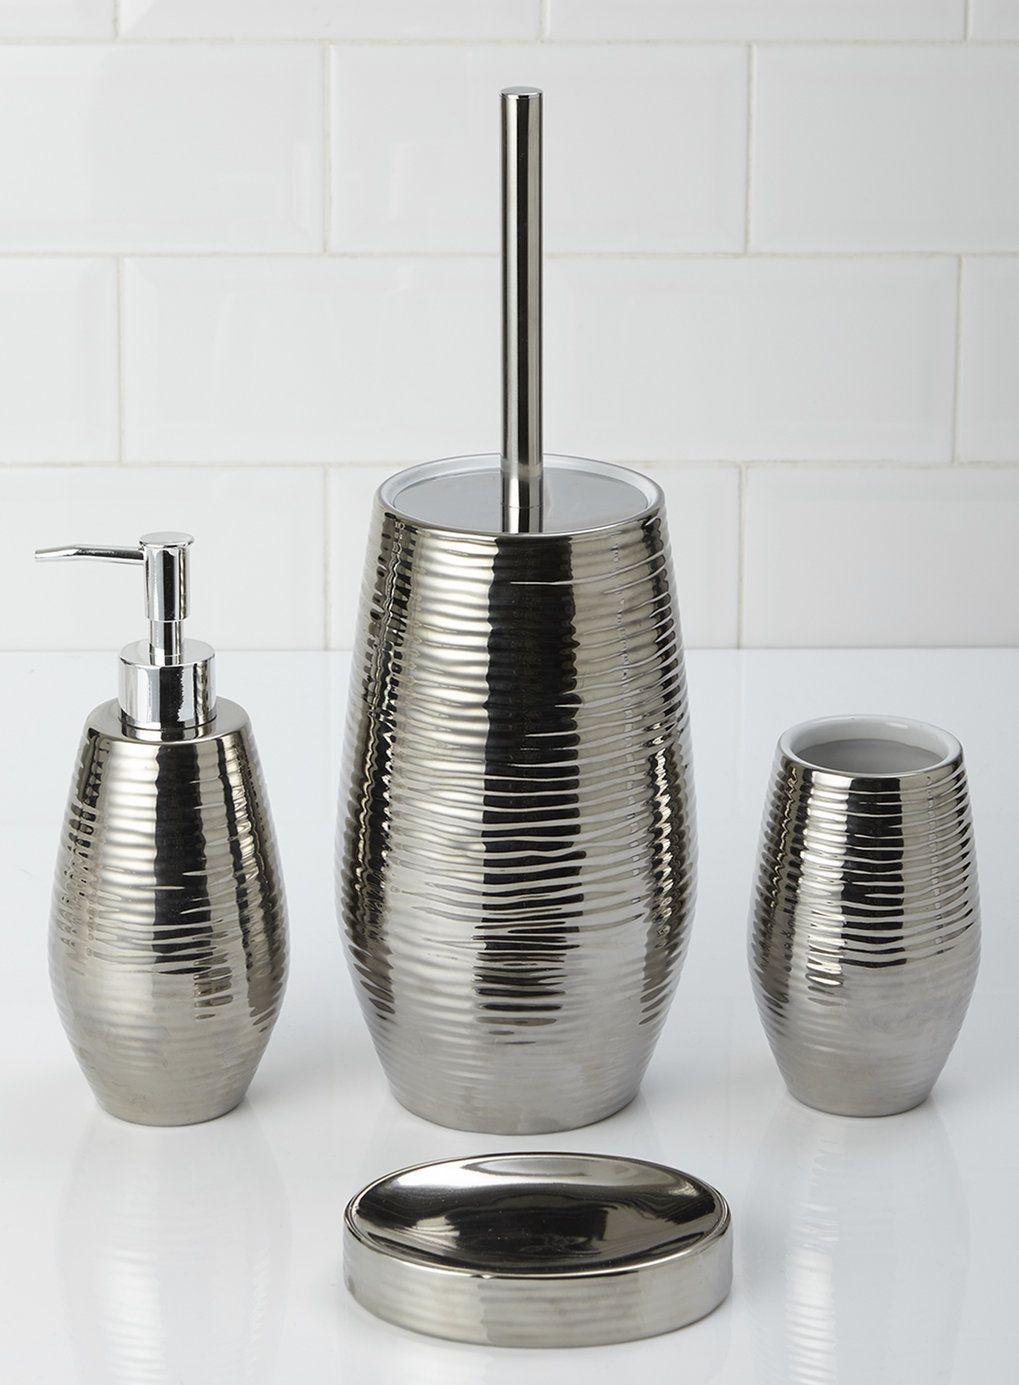 Photo 2 of Textured Metalic Soap Dispenser | Soap dispancers ...